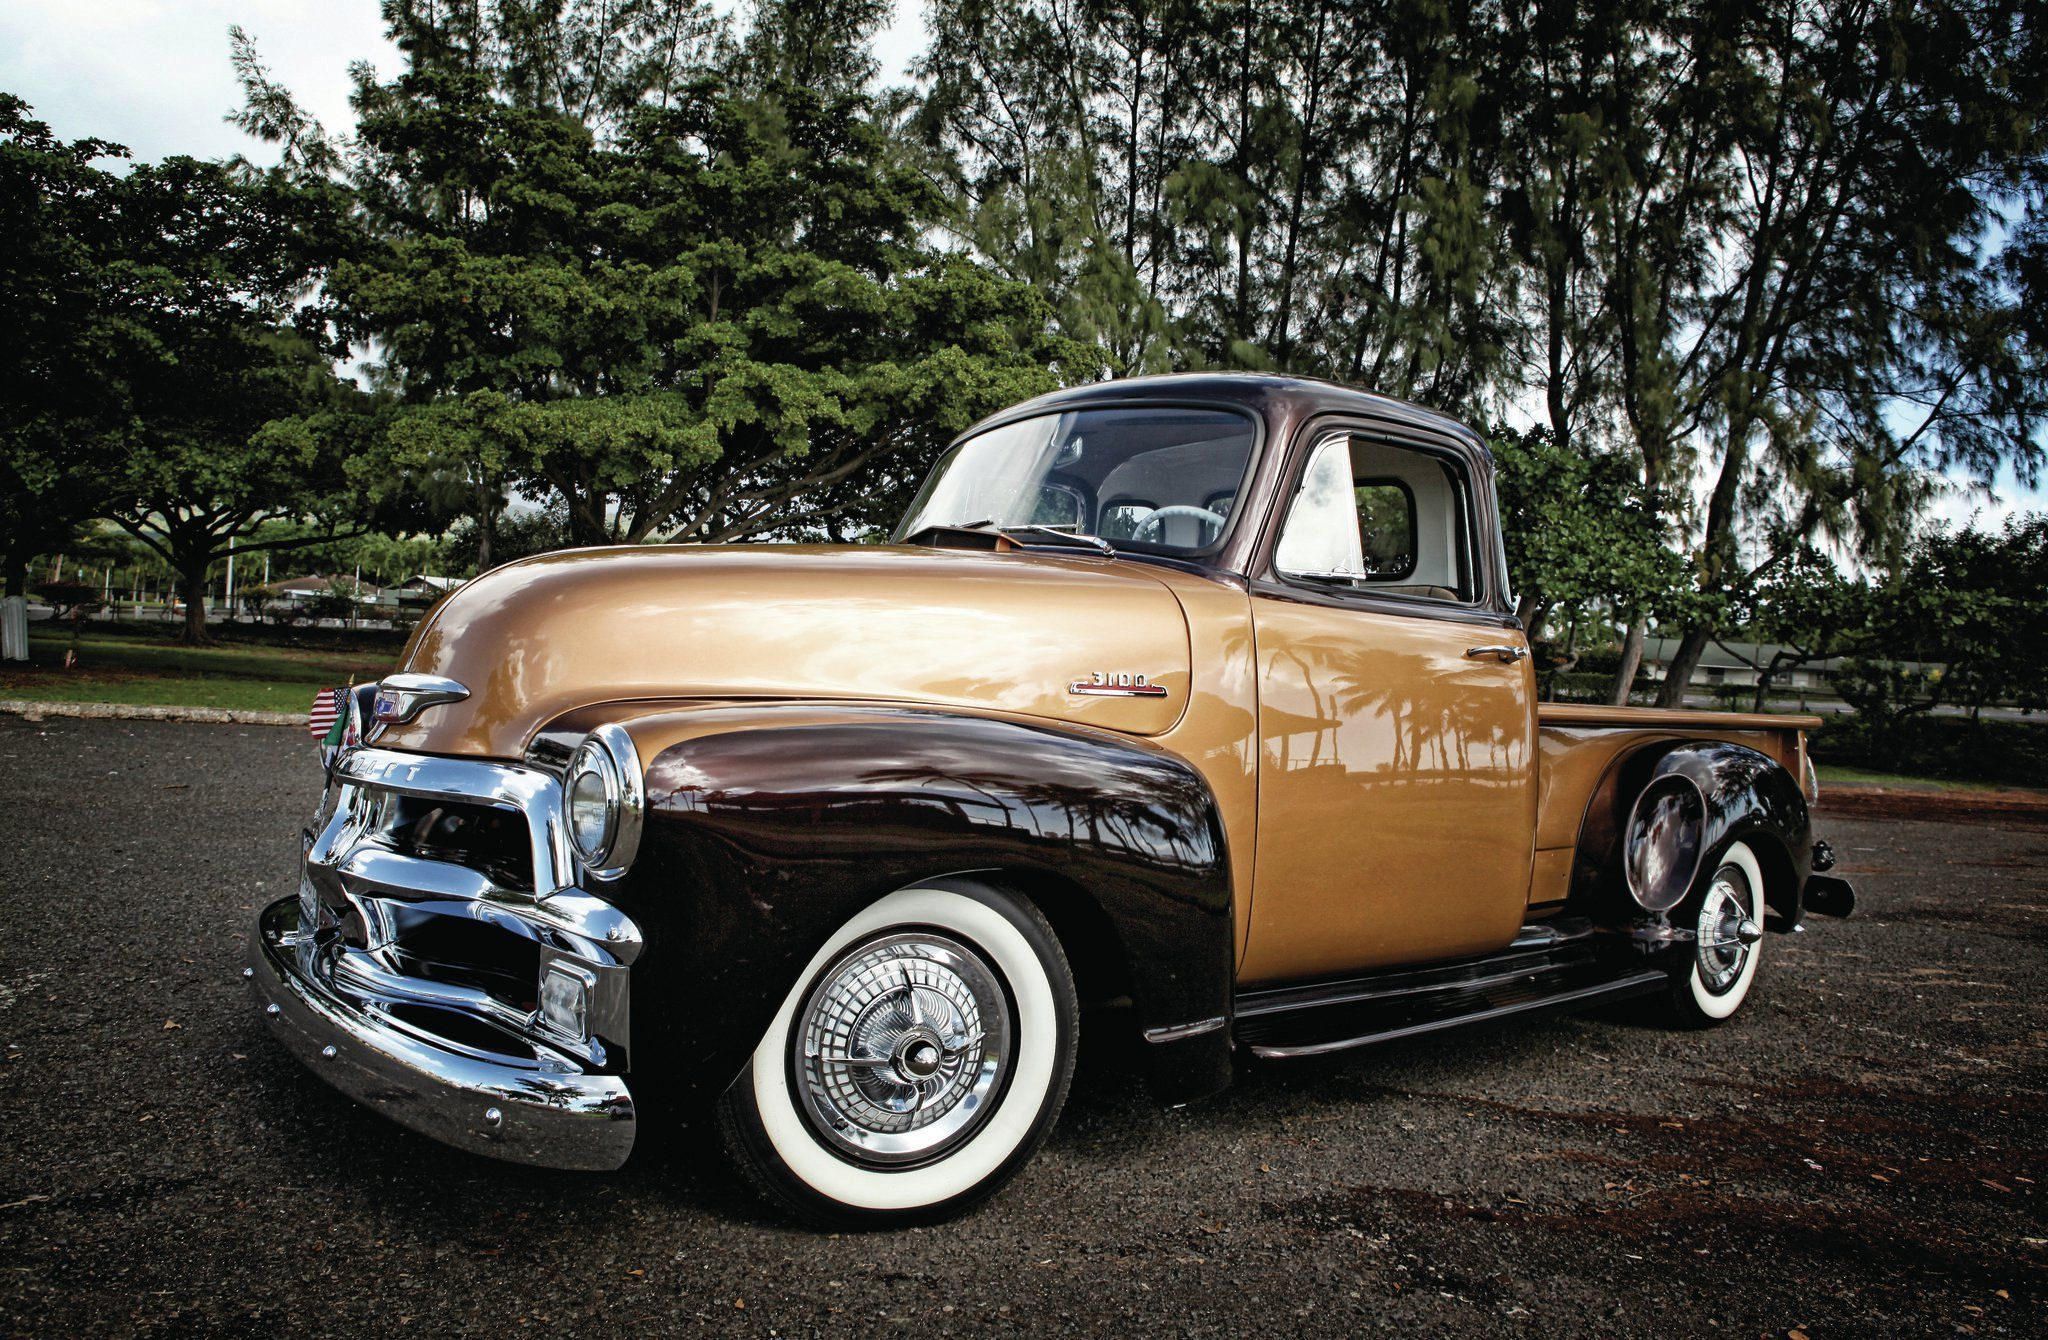 1954 Chevrolet 3100 Pickup Retro Lowrider Wallpaper 2048x1340 484298 Wallpaperup Classic Cars Trucks Vintage Pickup Trucks Chevy Trucks